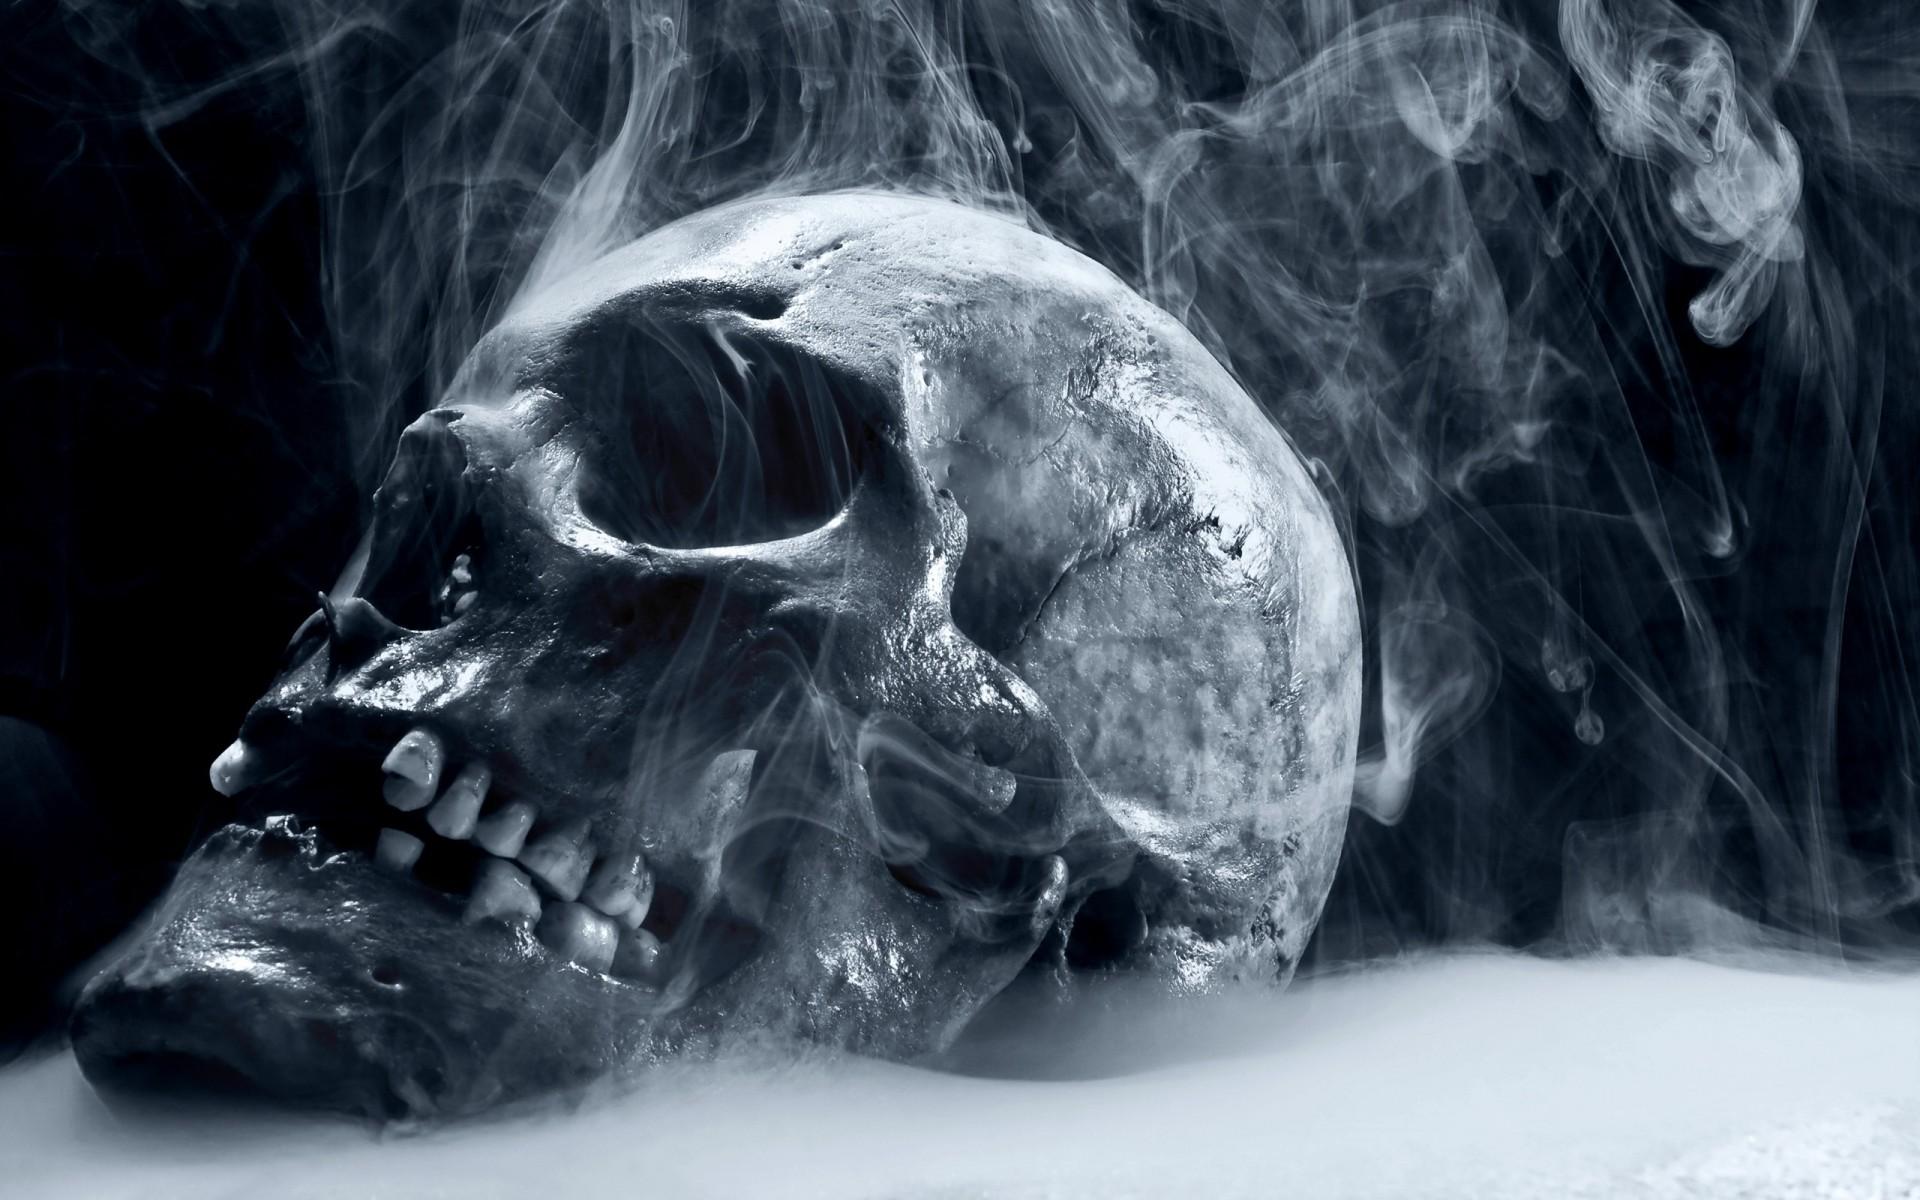 Skull hd wallpaper 66 images - Skull 4k images ...